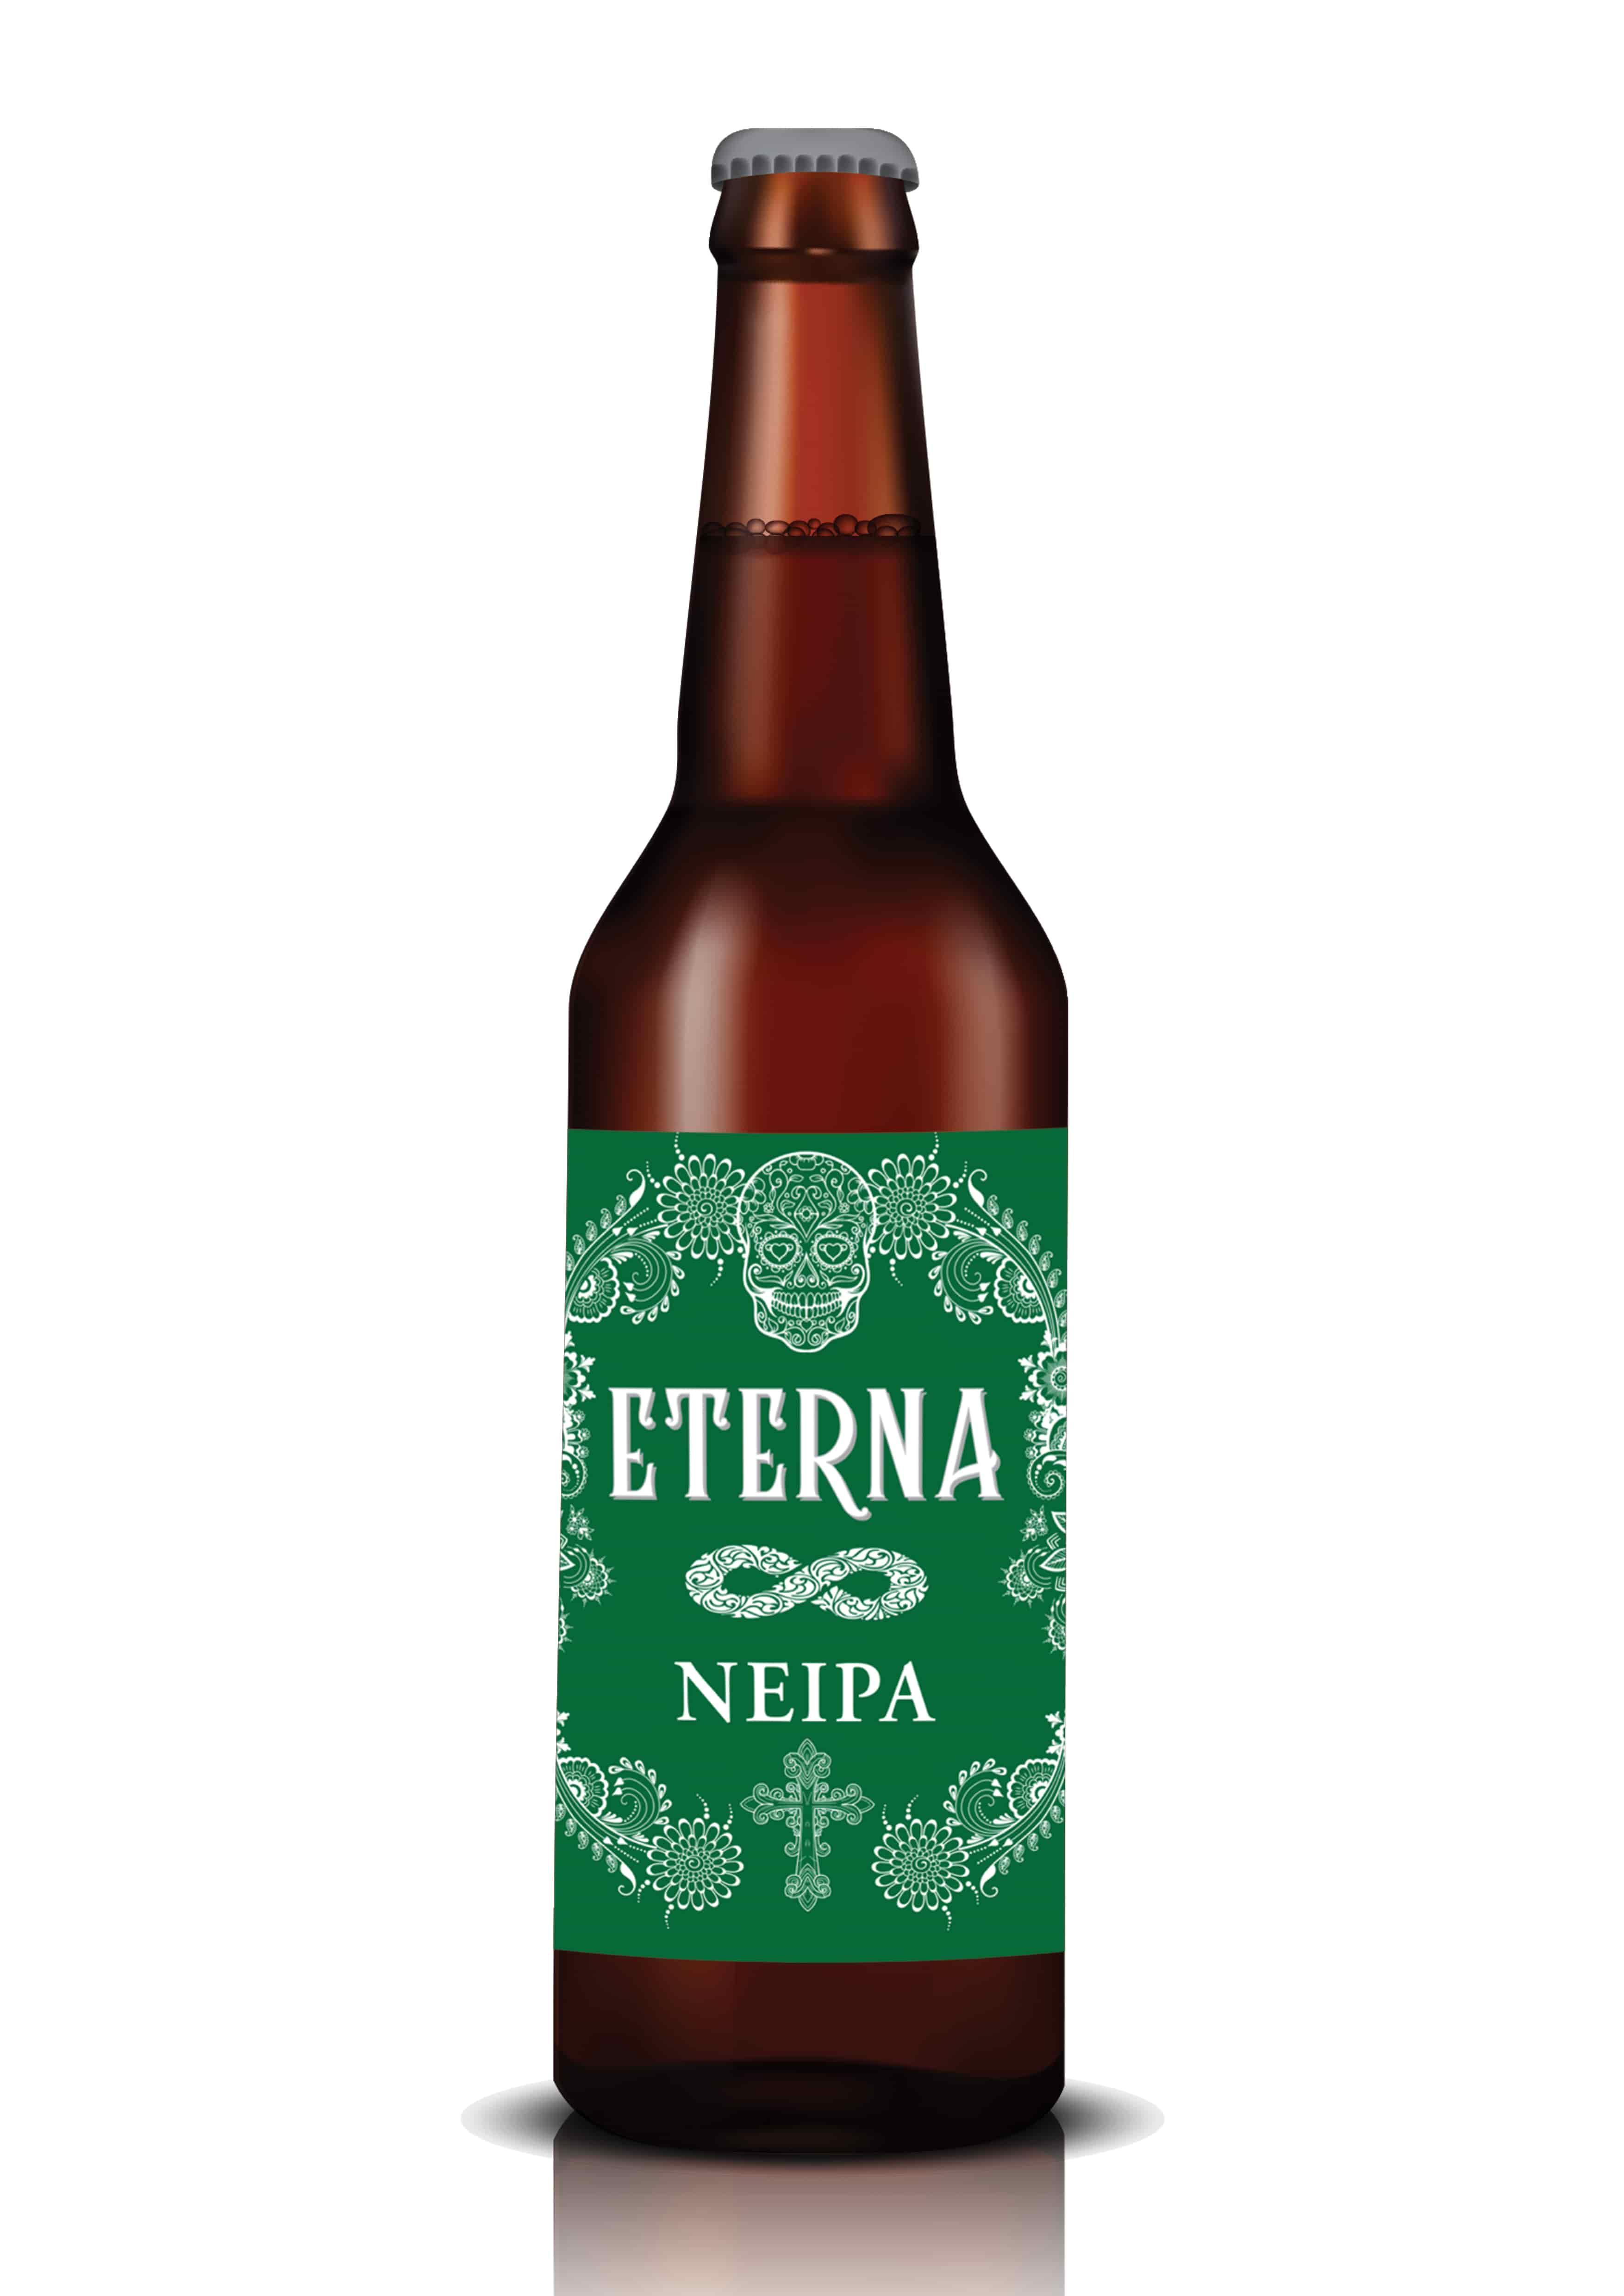 Cervezas Eterna